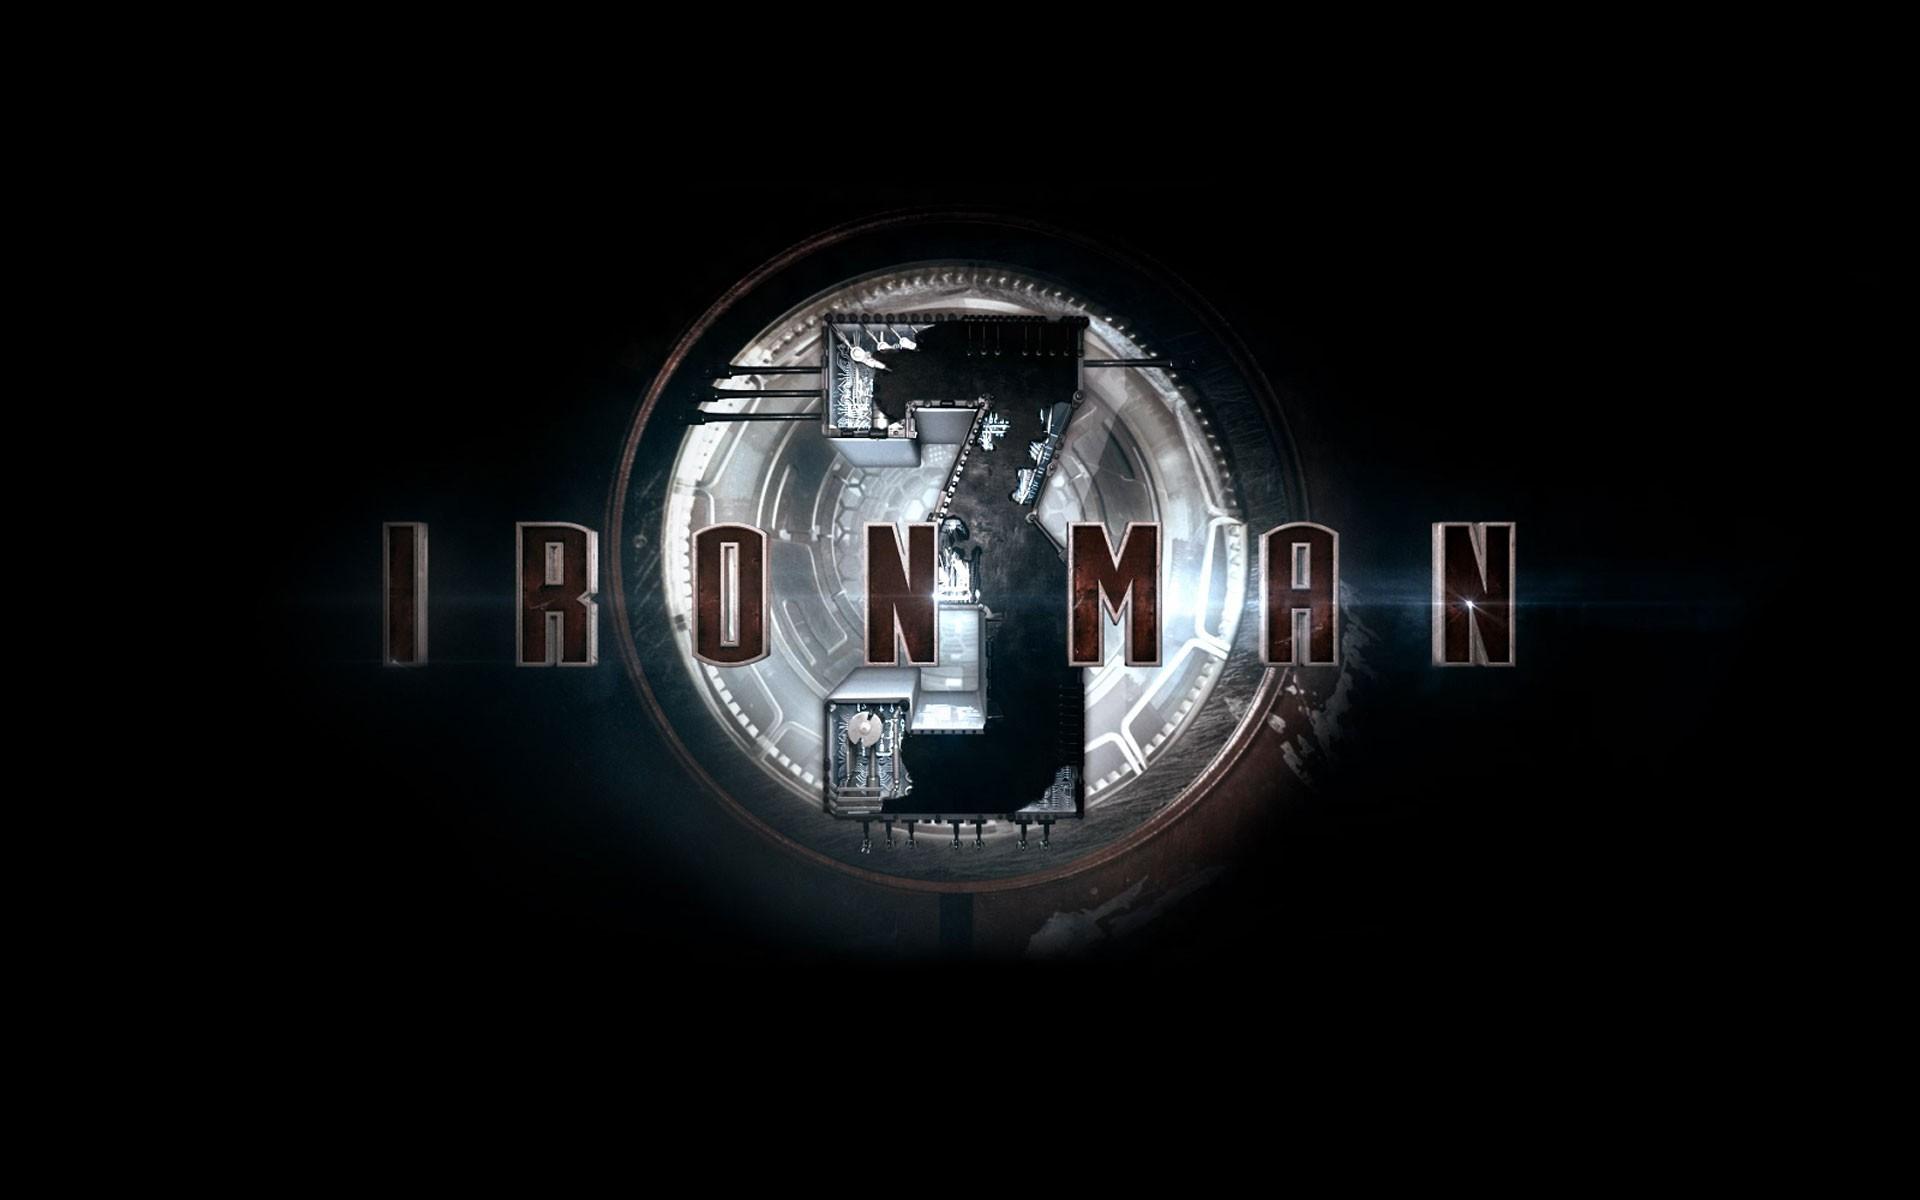 Iron Man 3 Trailer wallpaper   1116705 1920x1200